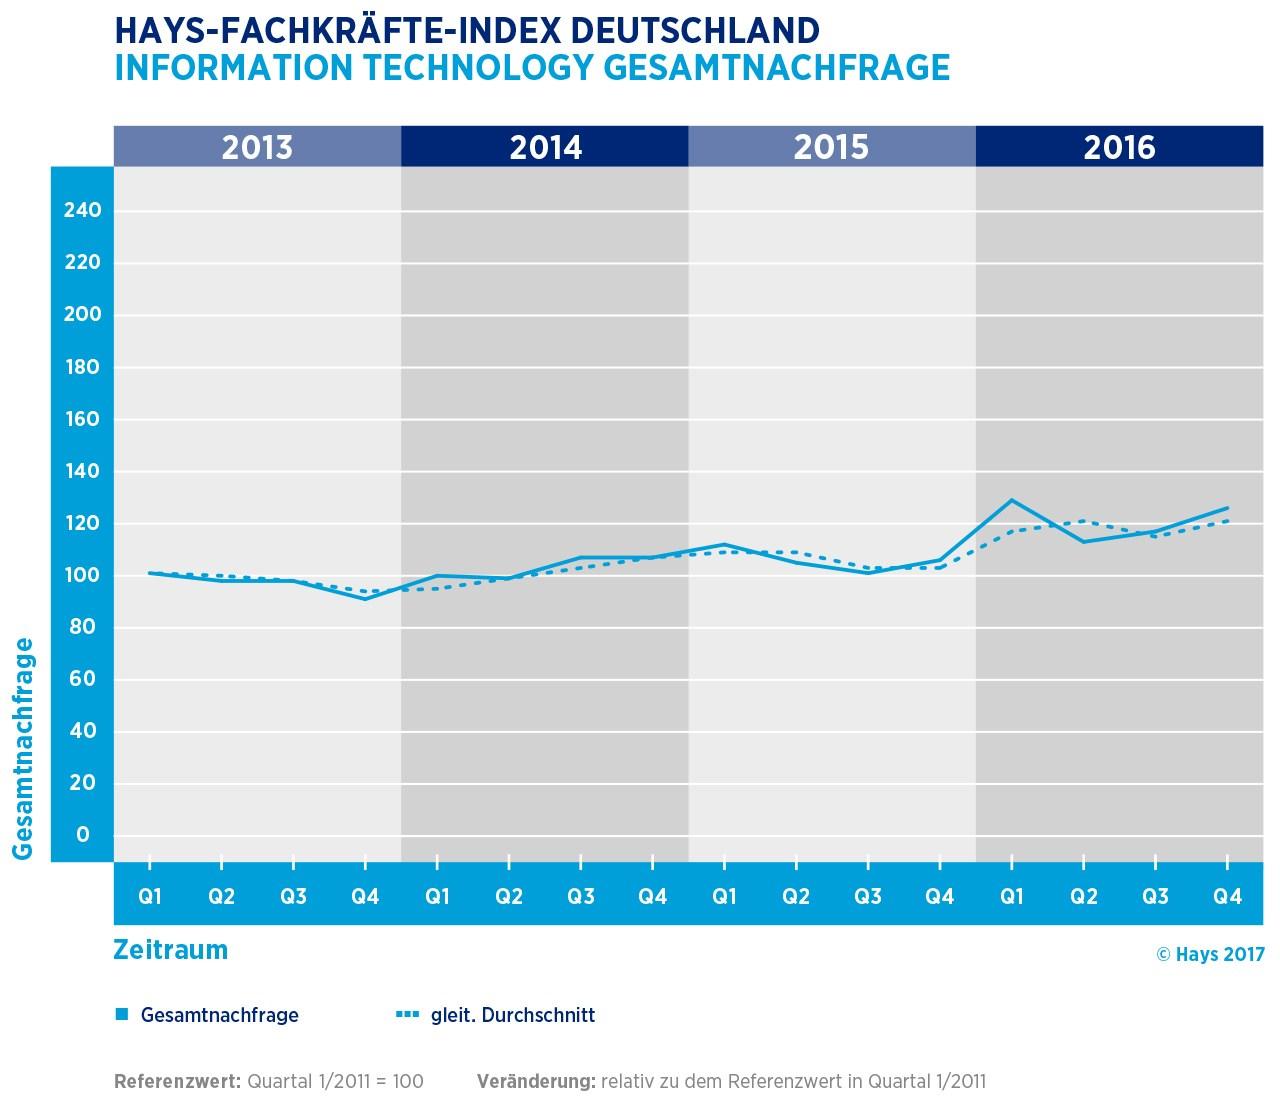 grafik hays fachkräfte-index de 2013 2016